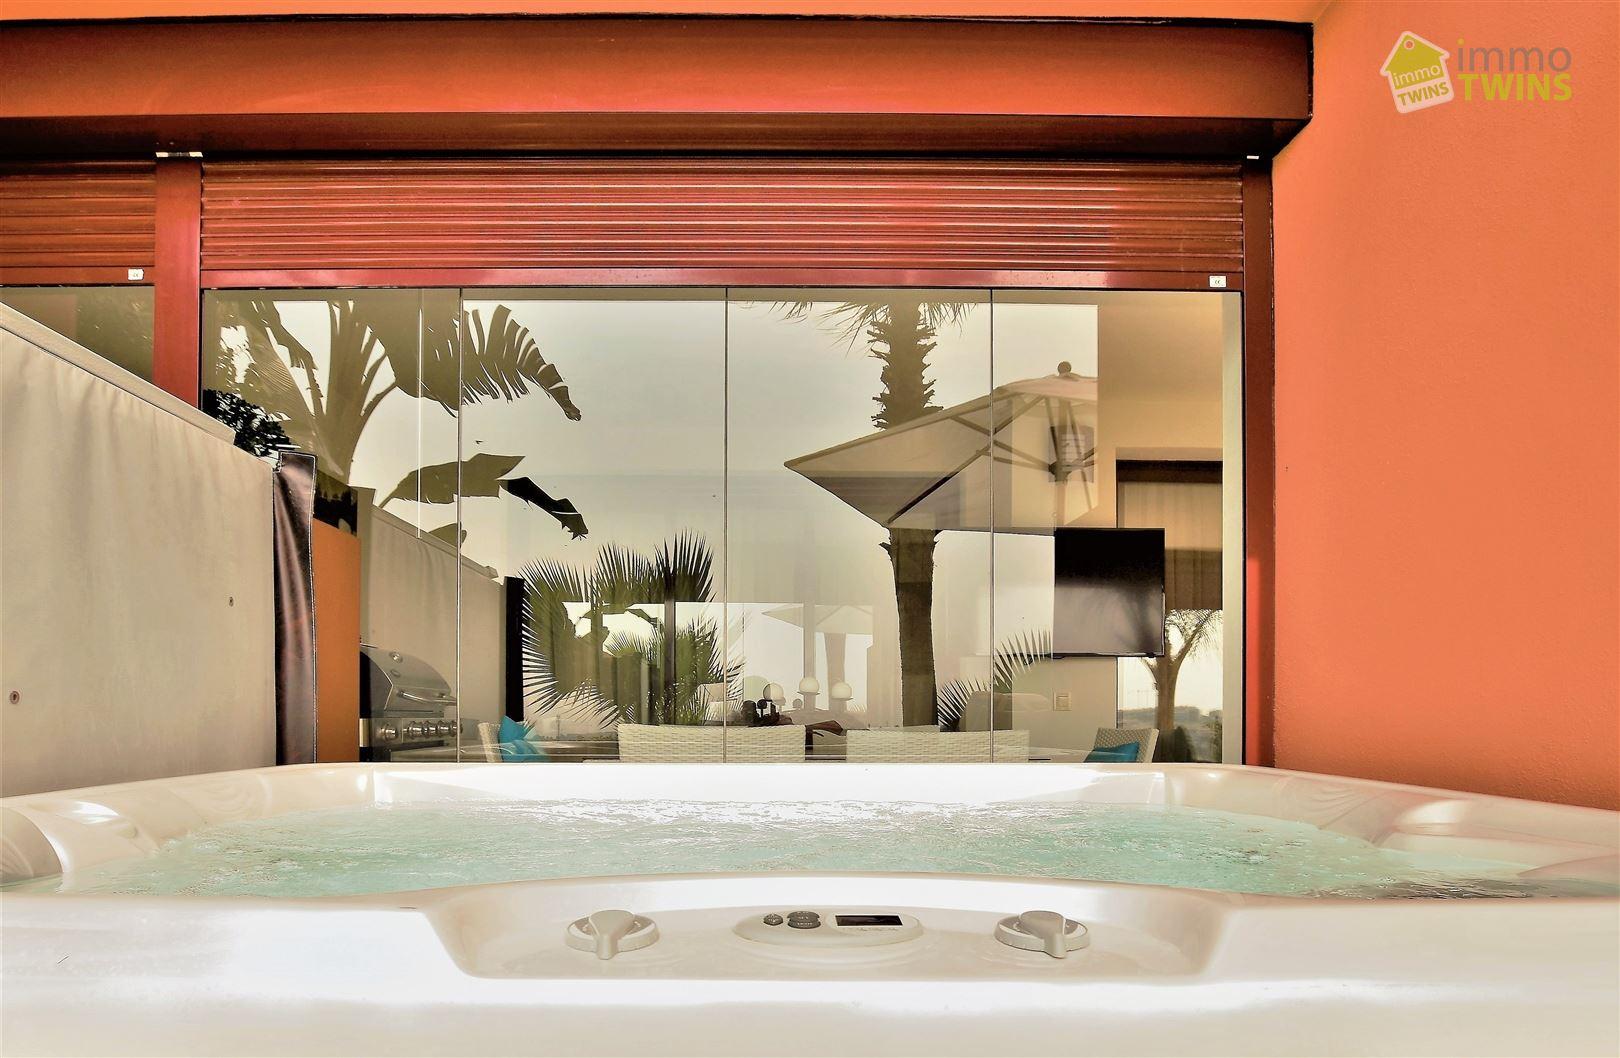 Foto 12 : Appartement te 29679 MARBELLA (Spanje) - Prijs € 485.000